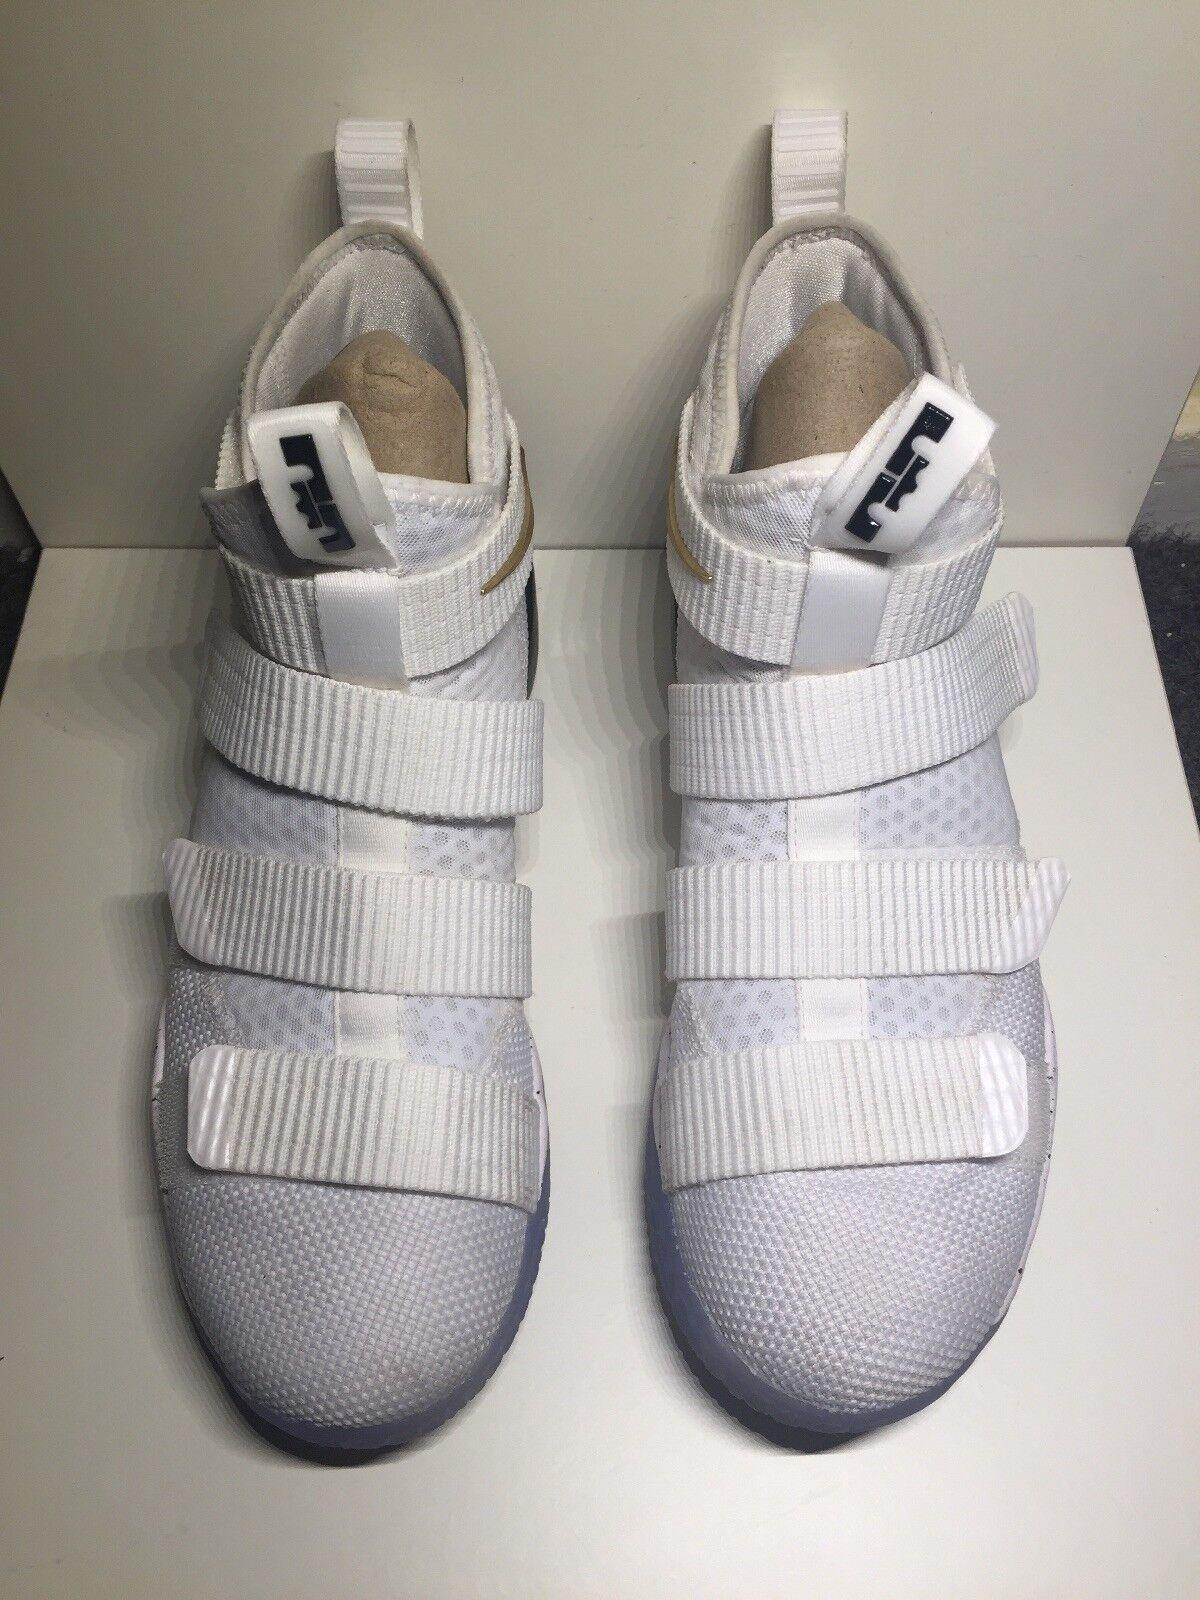 c2dbef8bba Nike Lebron Soldier Sz 8.5 897644-101 XI npbgah3646-Athletic Shoes ...